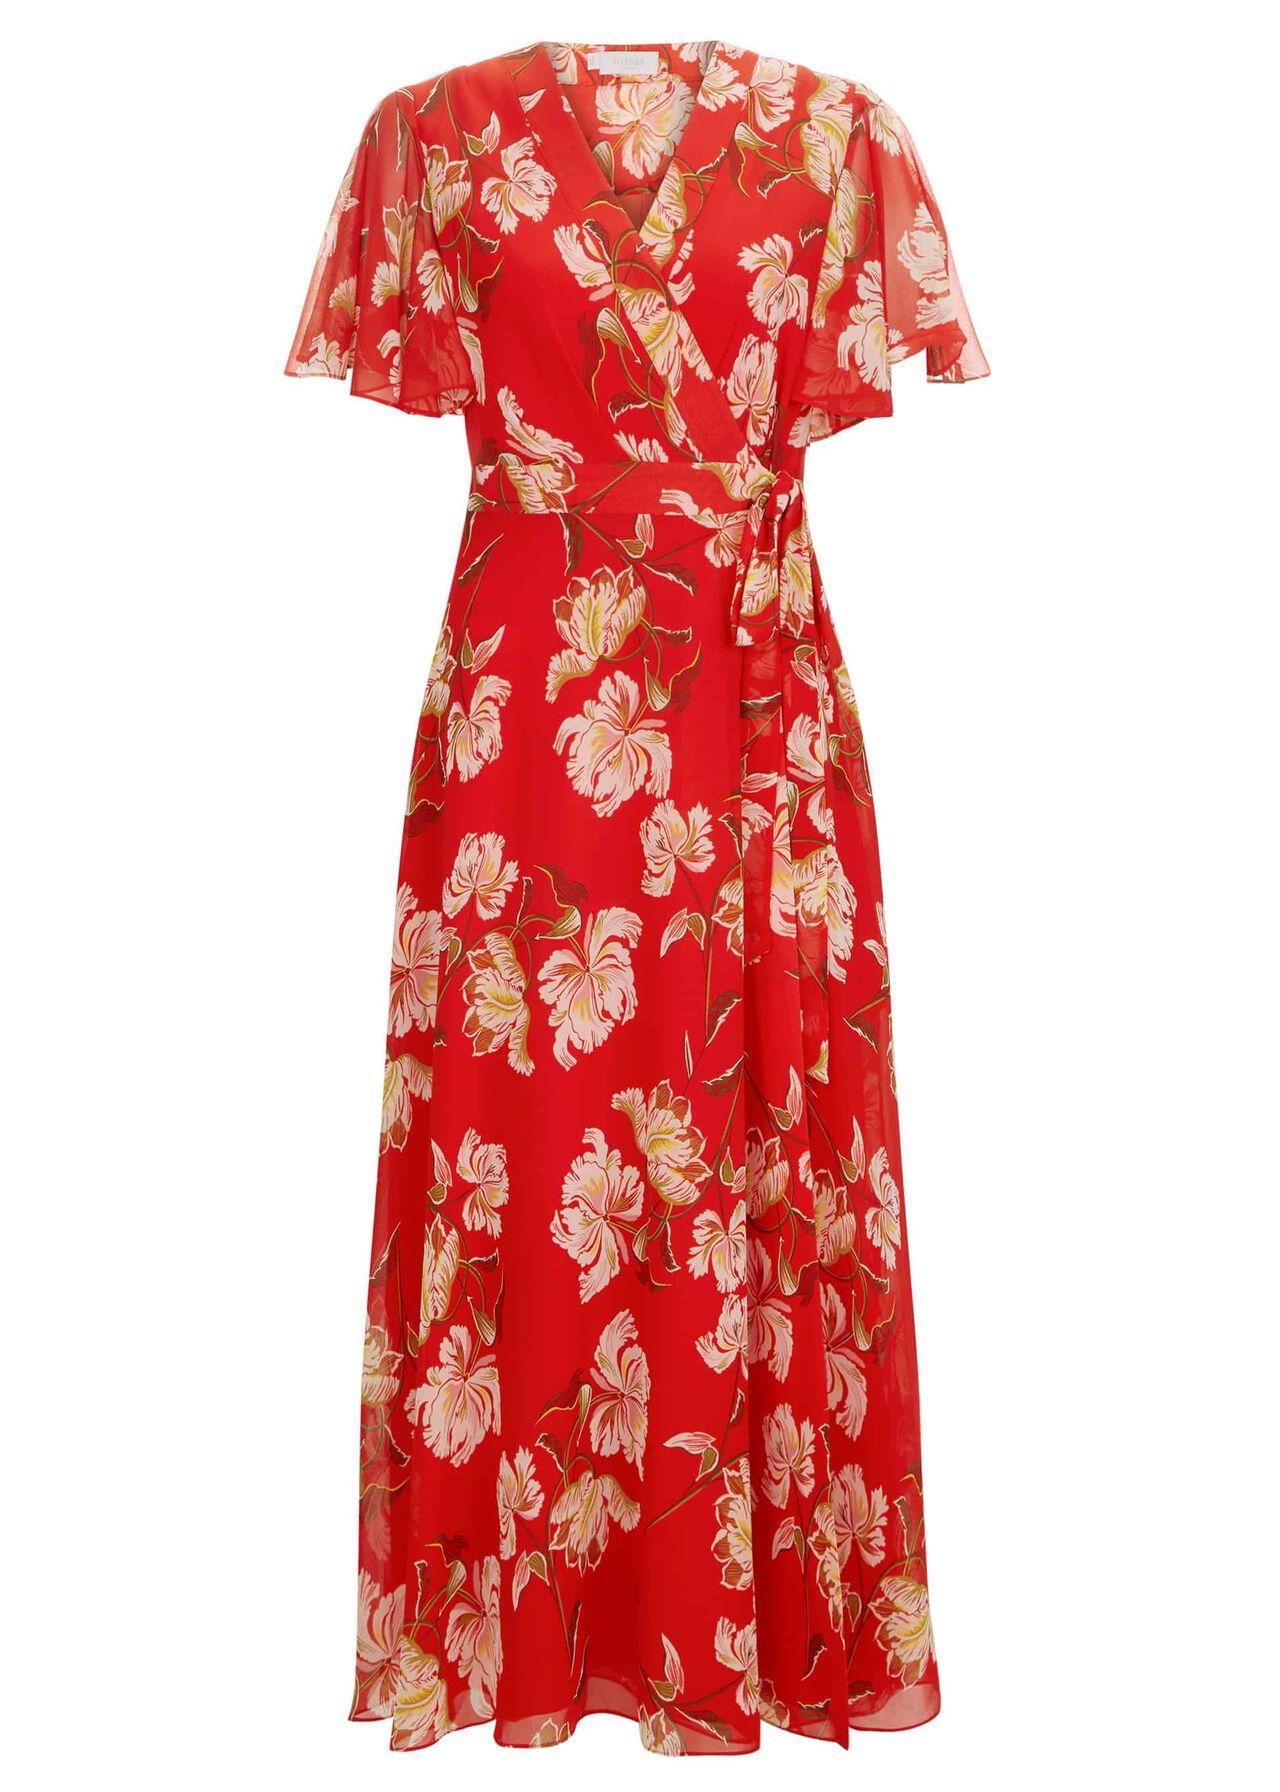 Ottilie Dress Red Multi